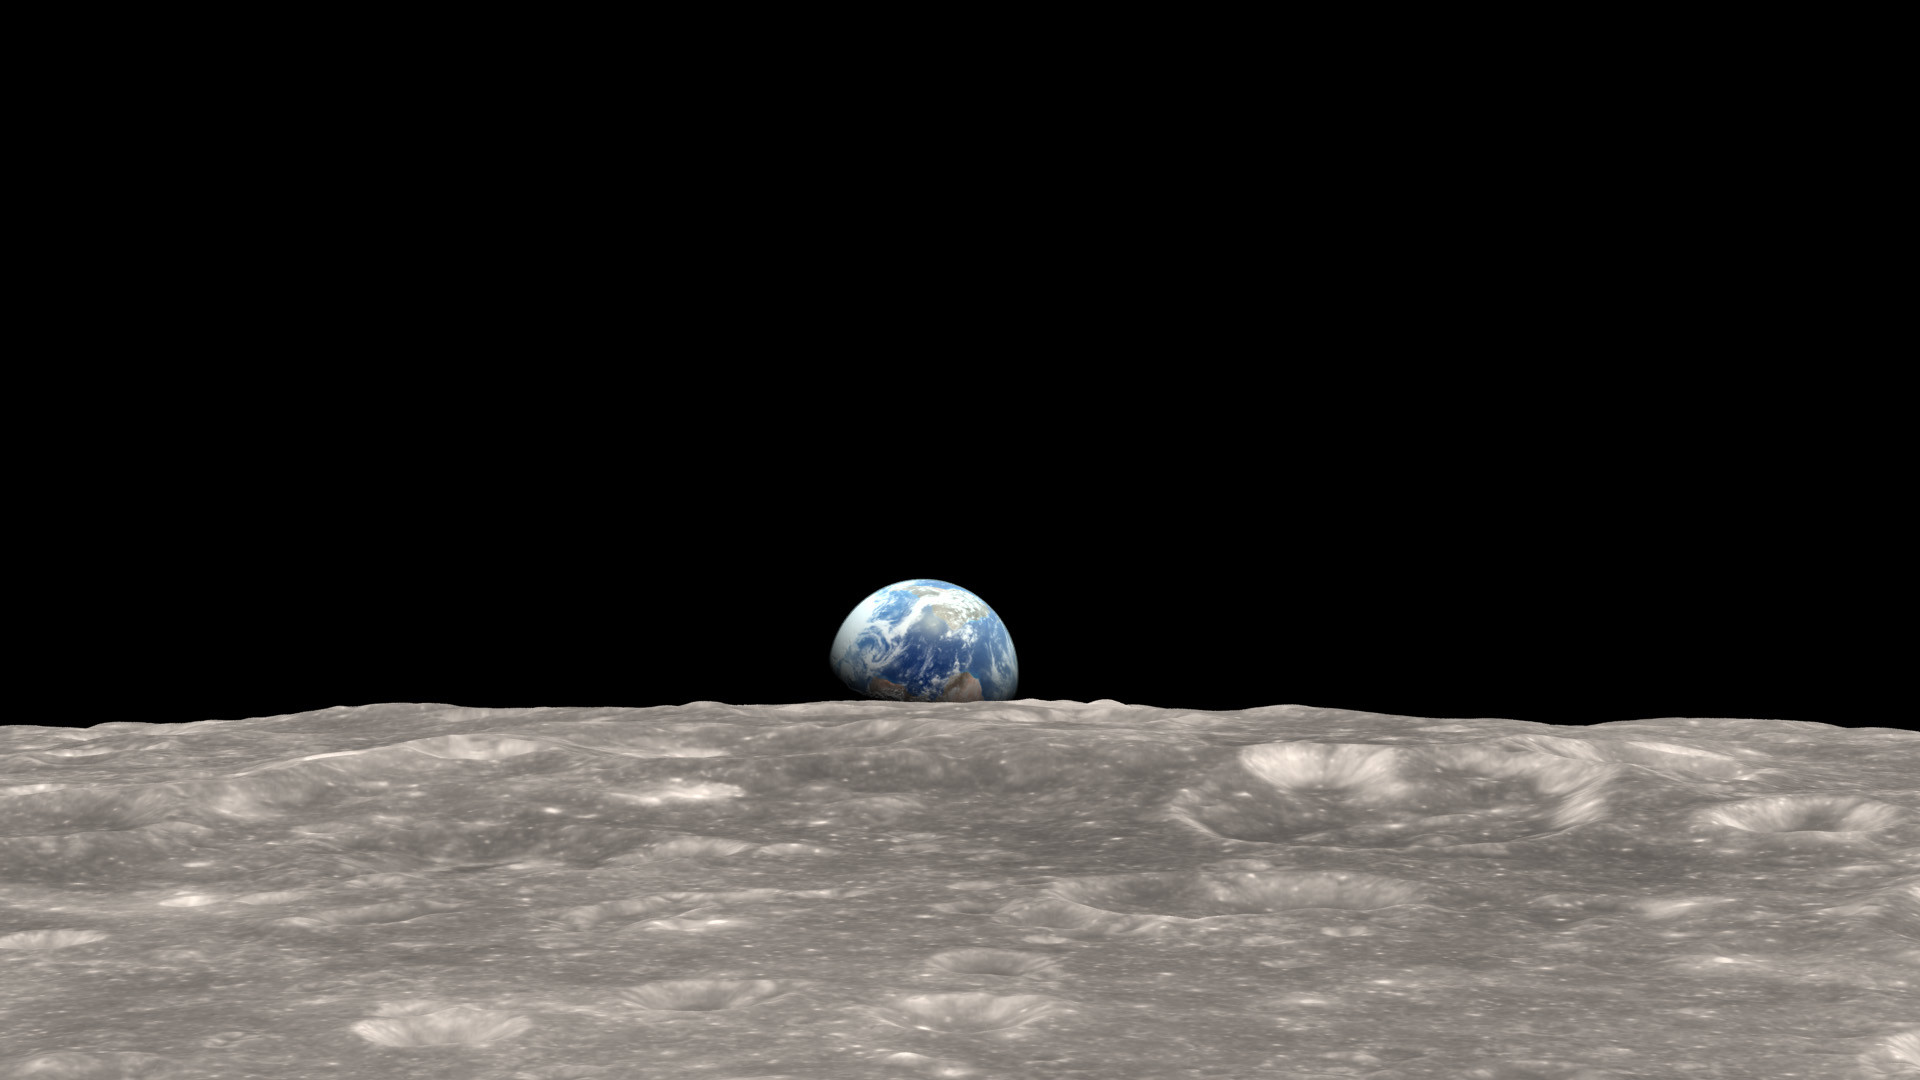 Res: 1920x1080, (NASA) [High resolution version]